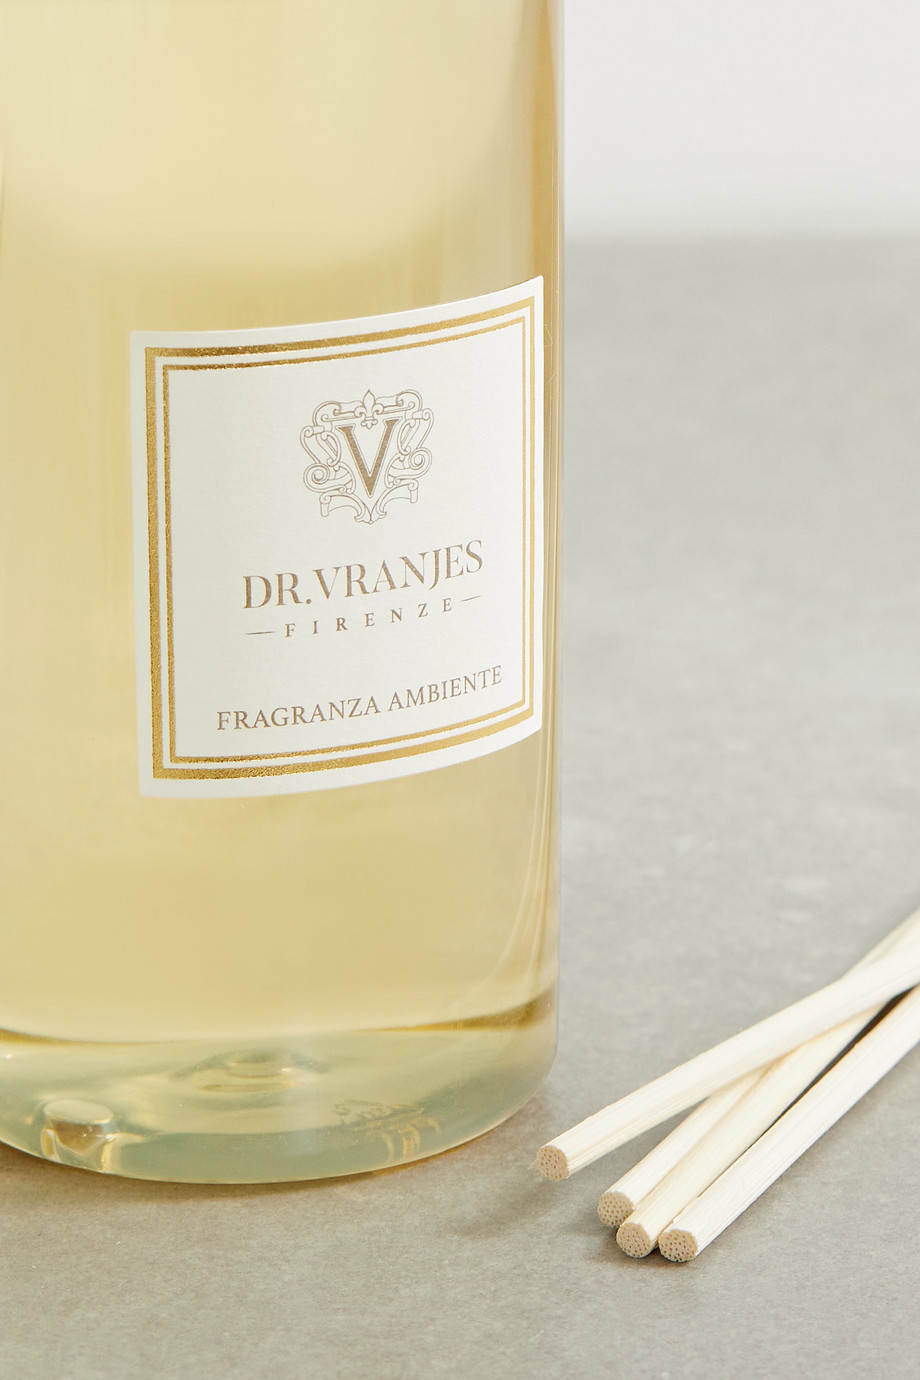 Dr. Vranjes Firenze Ambra reed diffuser refill, 500ml